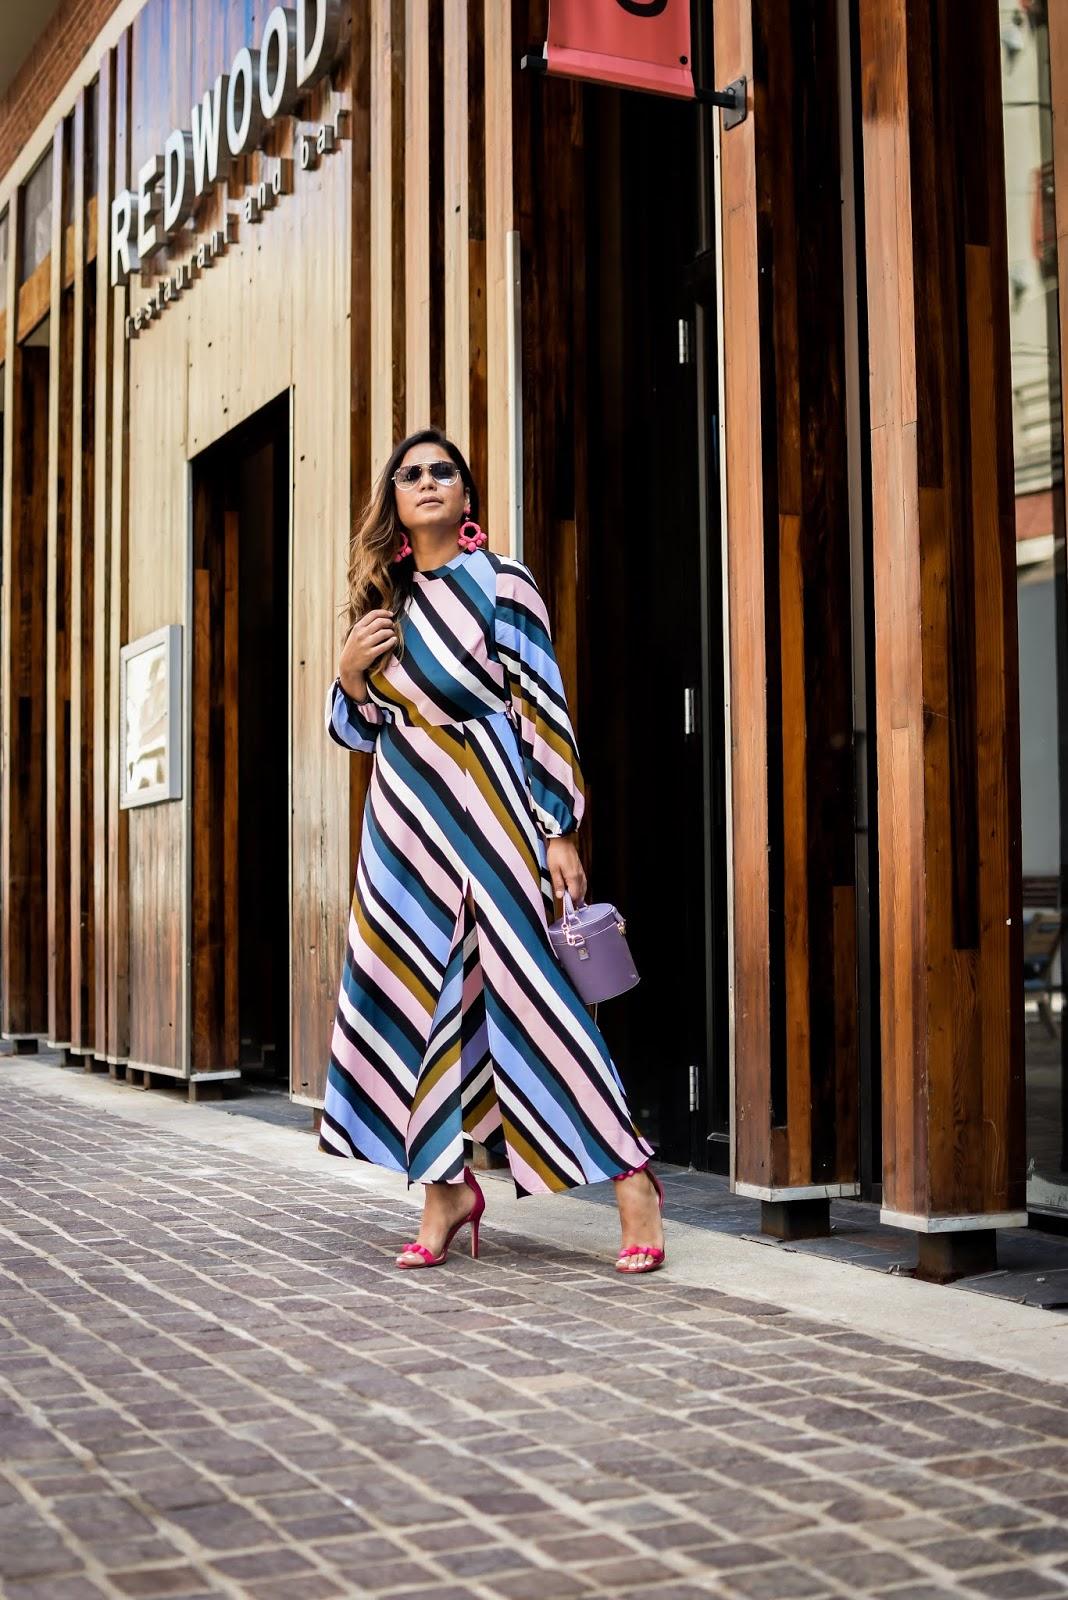 topshop stripe dress, front slit dress nordstrom, under $100 dress, fall dresses, white vest, gillet style, sam edleman pink beaded heels, fall ootd, fall fashion, dc blogger, statement earrings, myriad musings